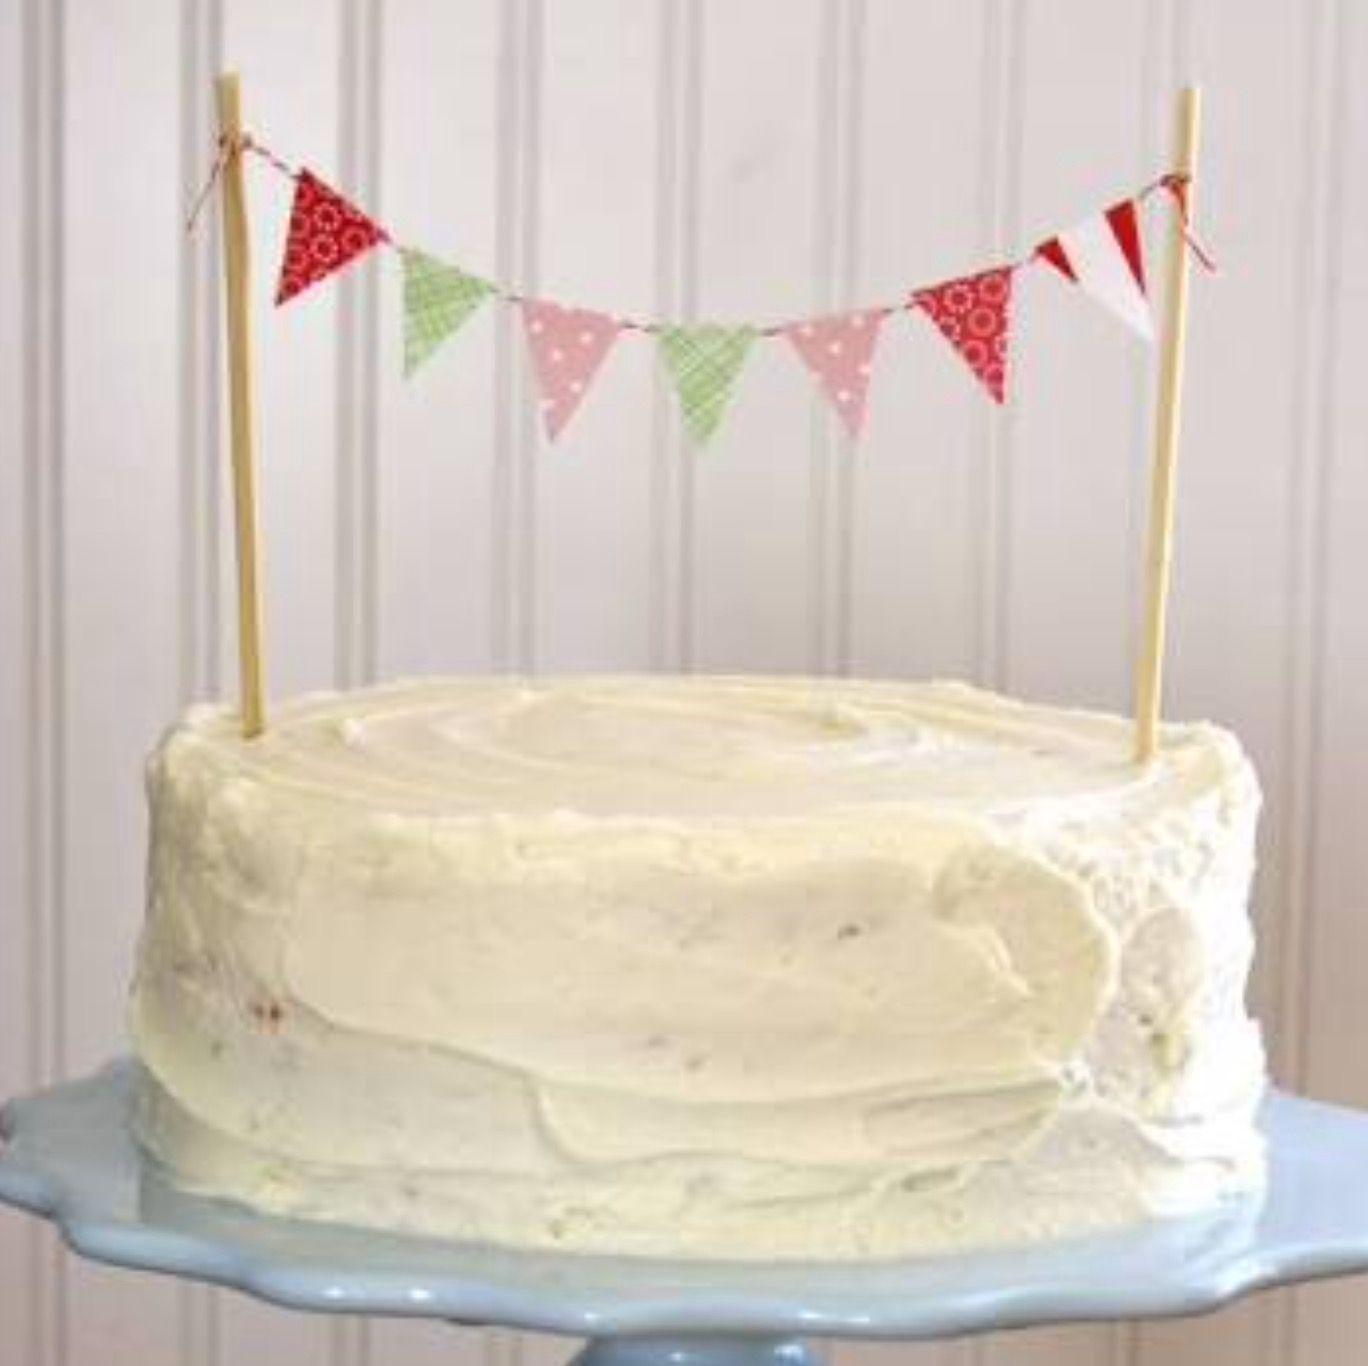 Pin by Ella Grayling on Cakes Pinterest Cake